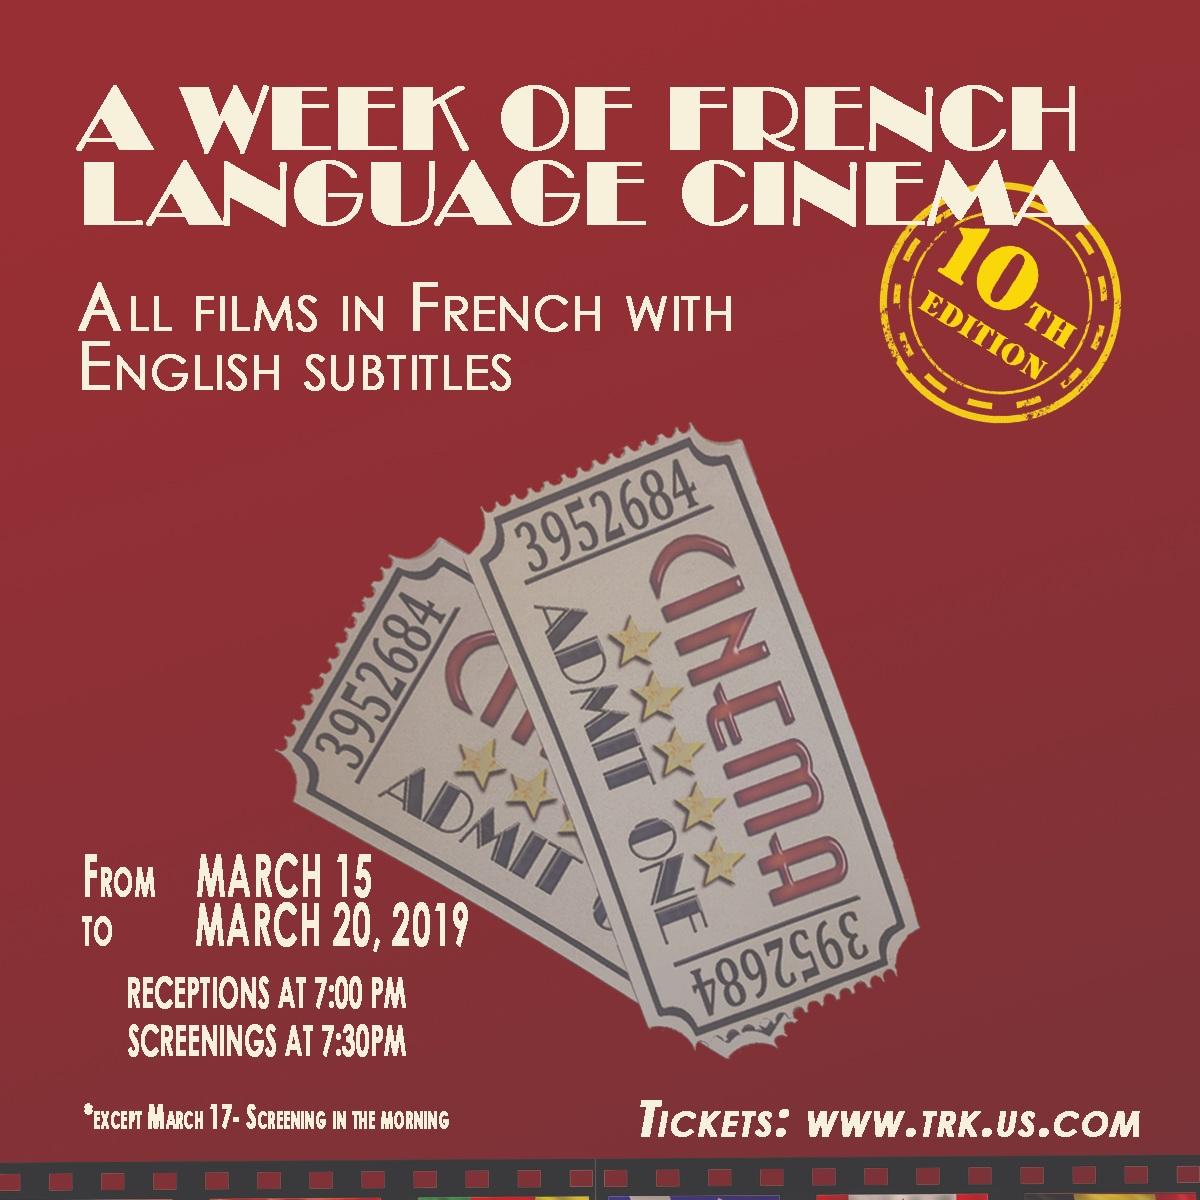 A Week Of French Language Cinema